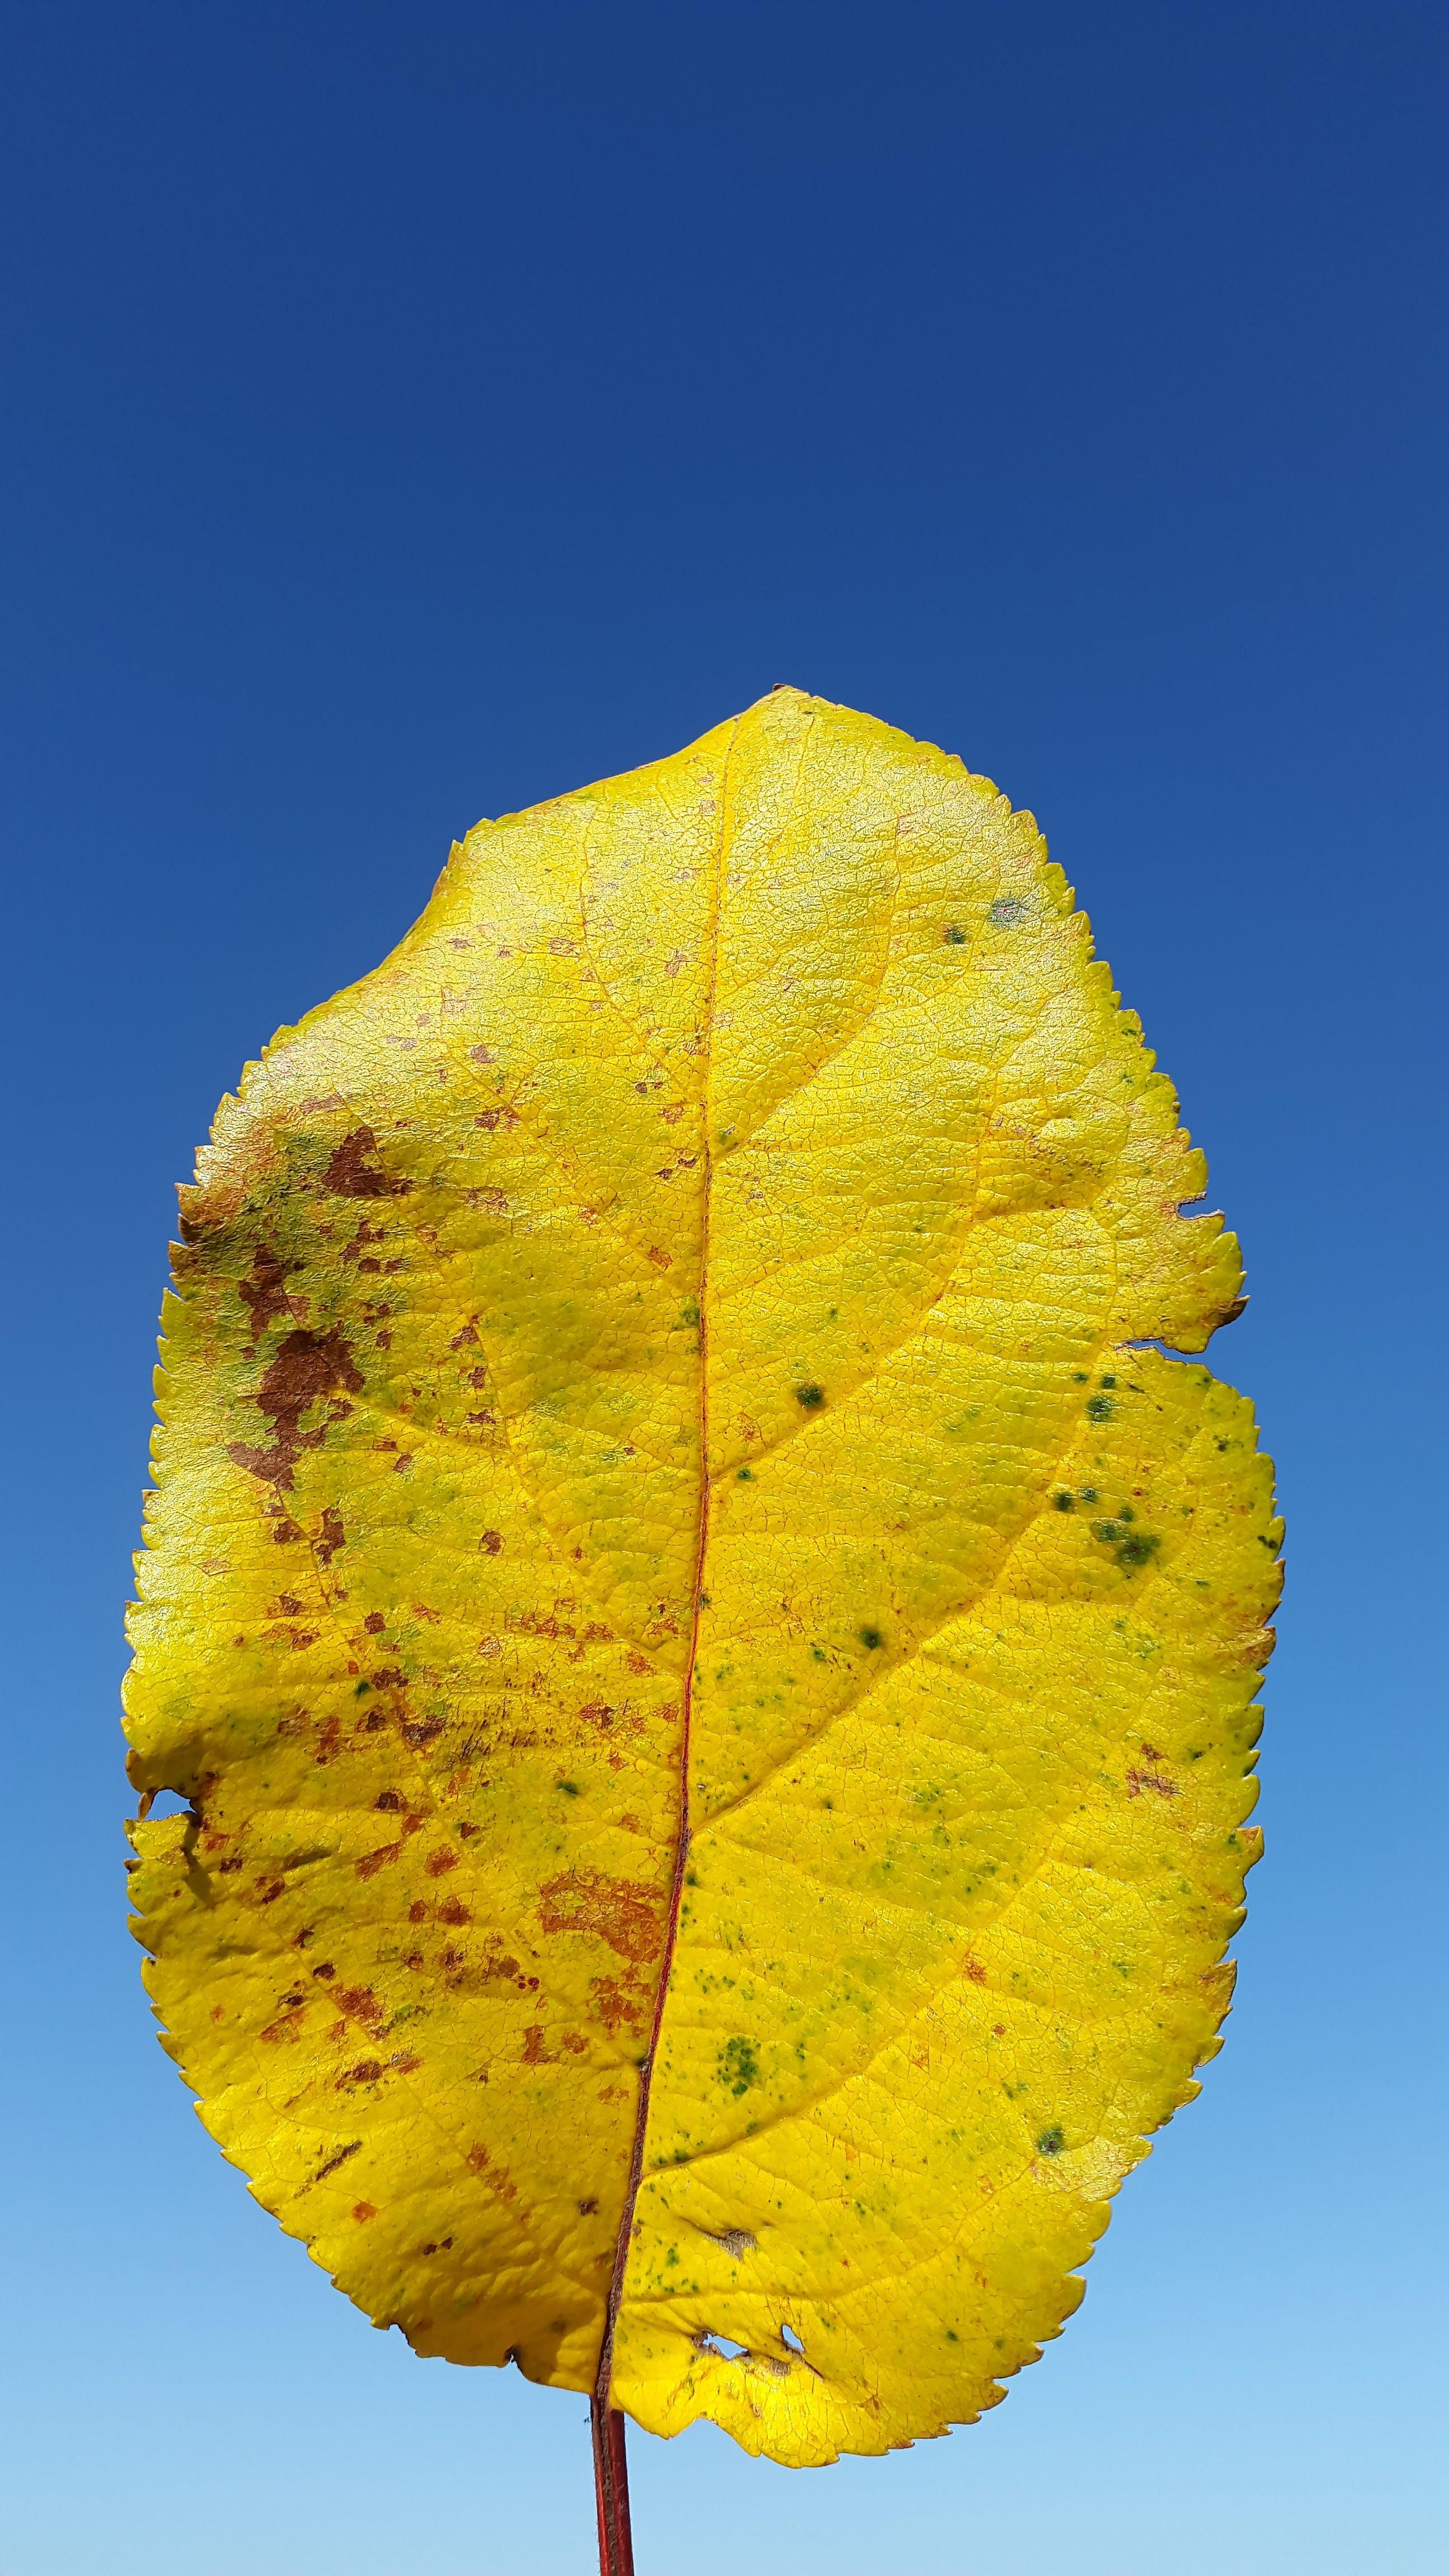 Free stock photo of deciduous tree, environment, environmental protection, grow